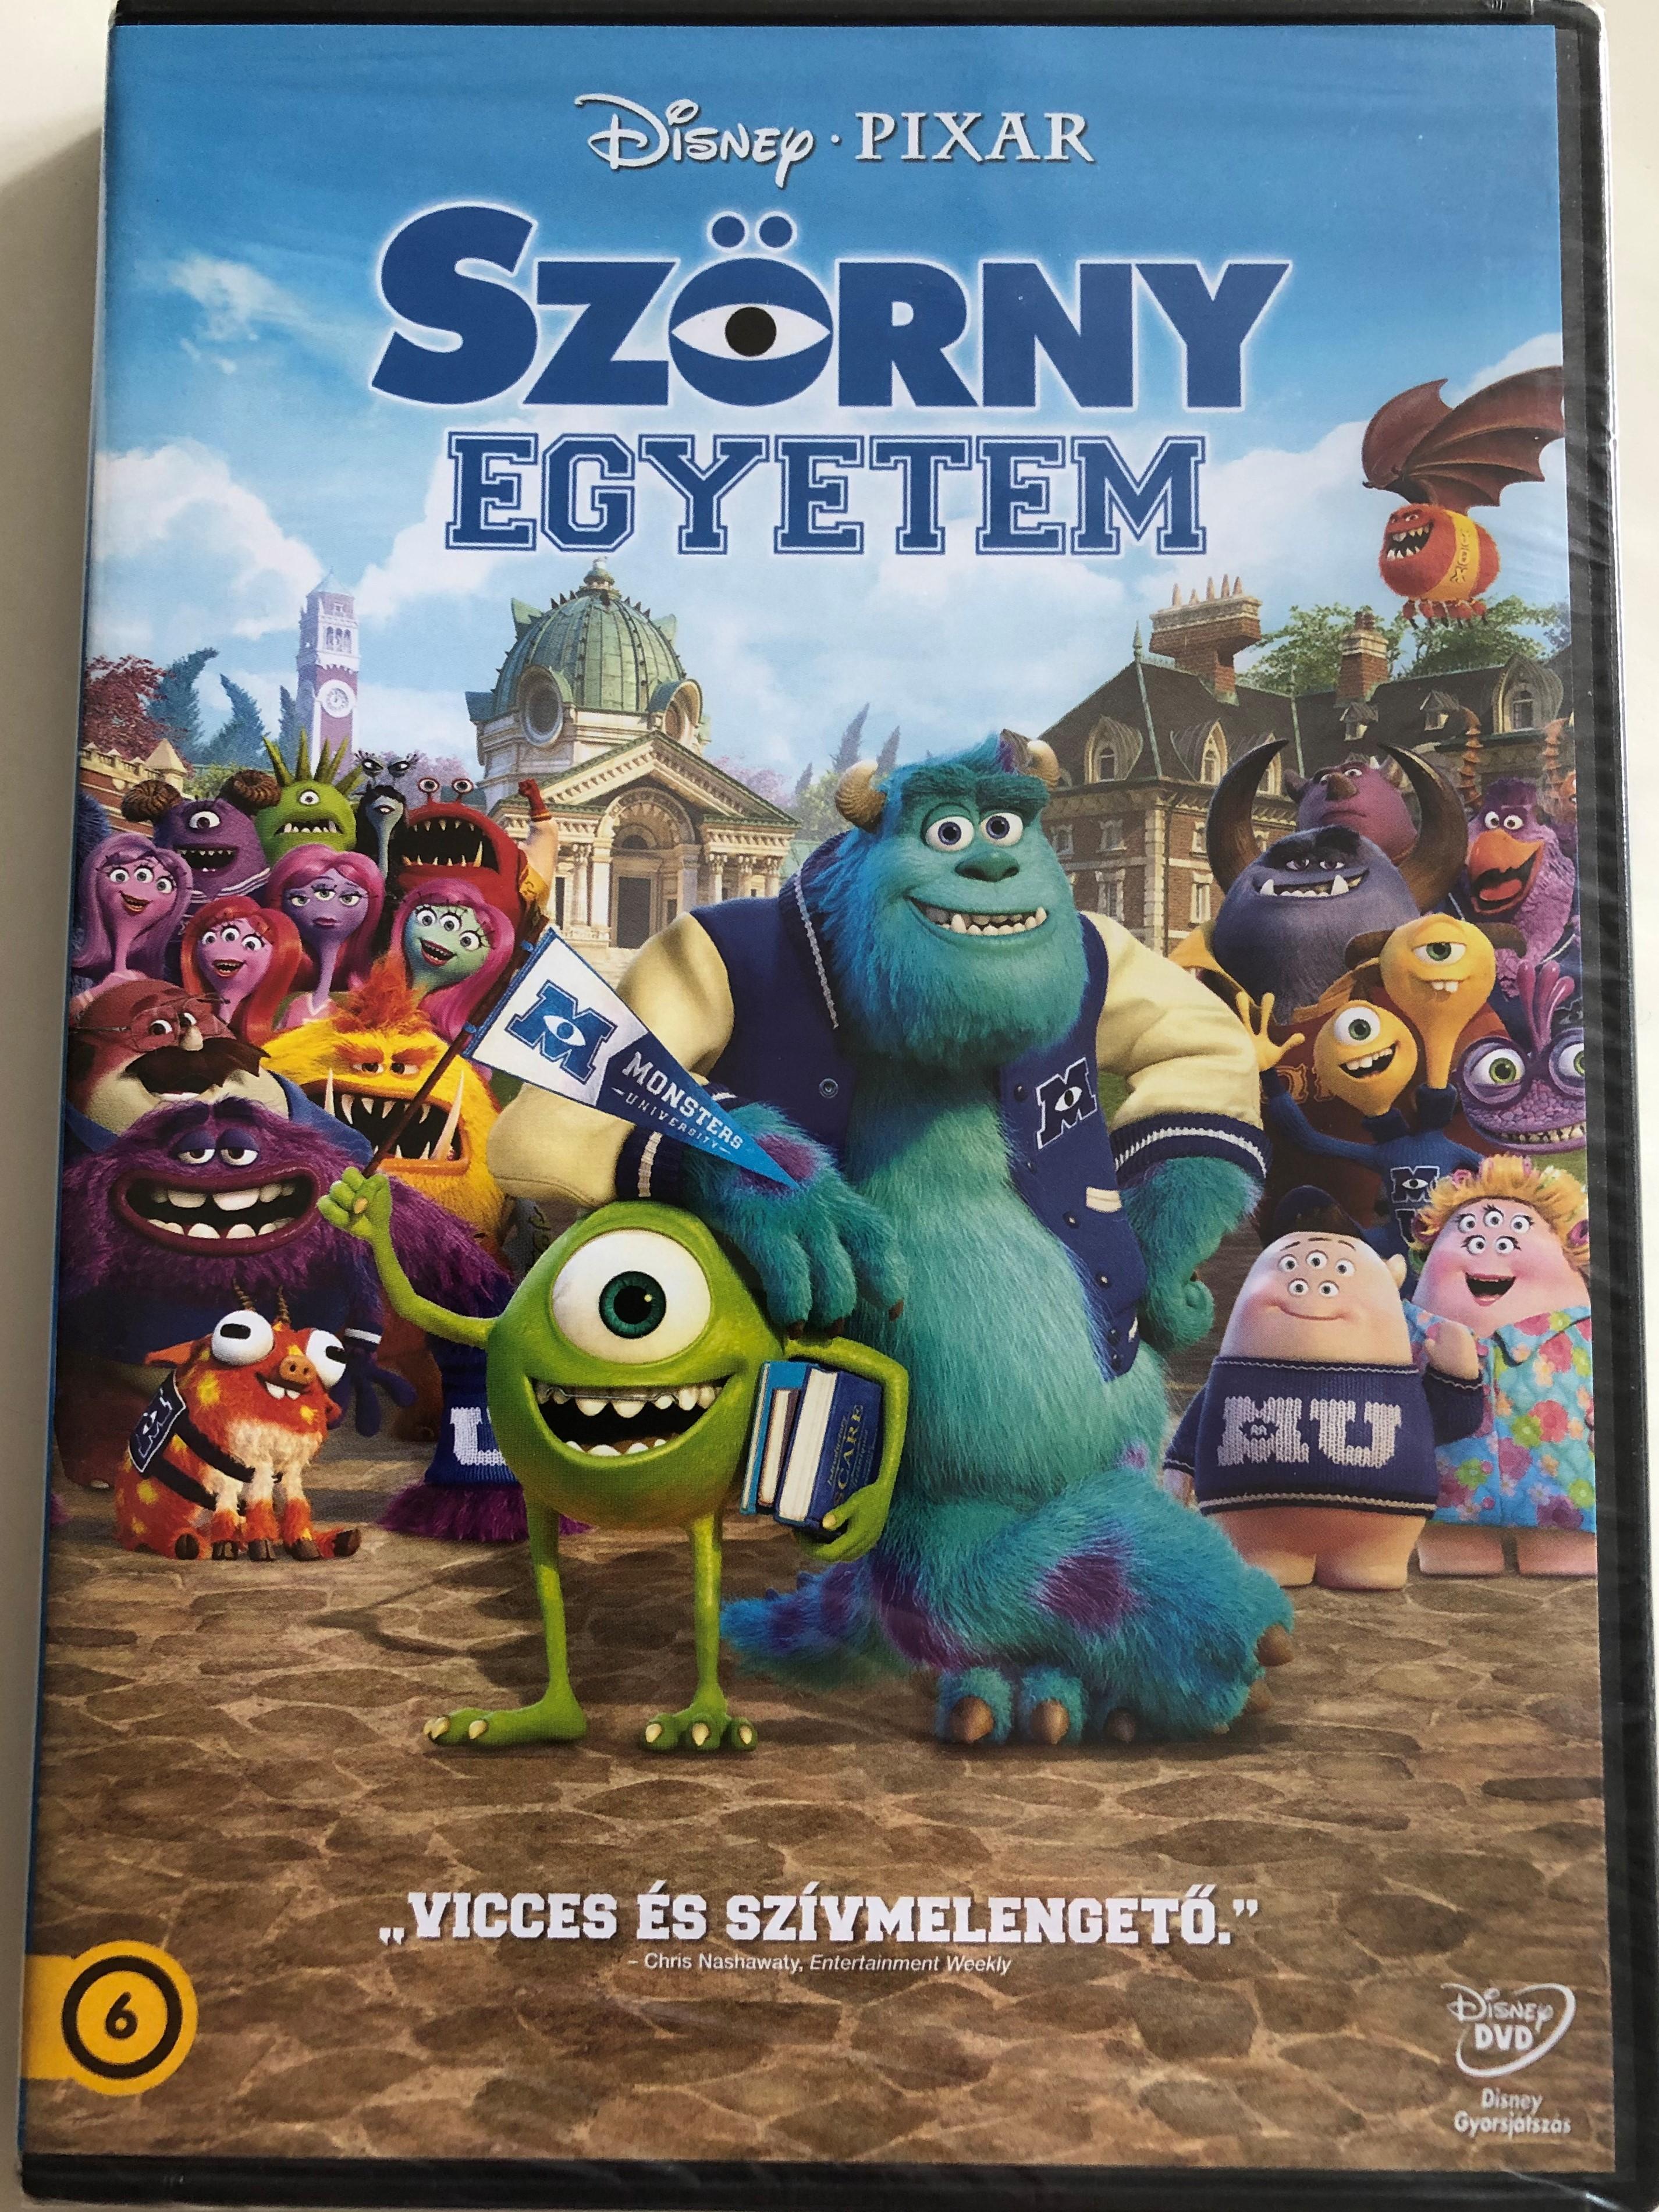 monsters-university-dvd-2013-sz-rny-egyetem-directed-by-dan-scanlon-starring-billy-crystal-john-goodman-steve-buscemi-kelsey-grammer-jennifer-tilly-1-.jpg